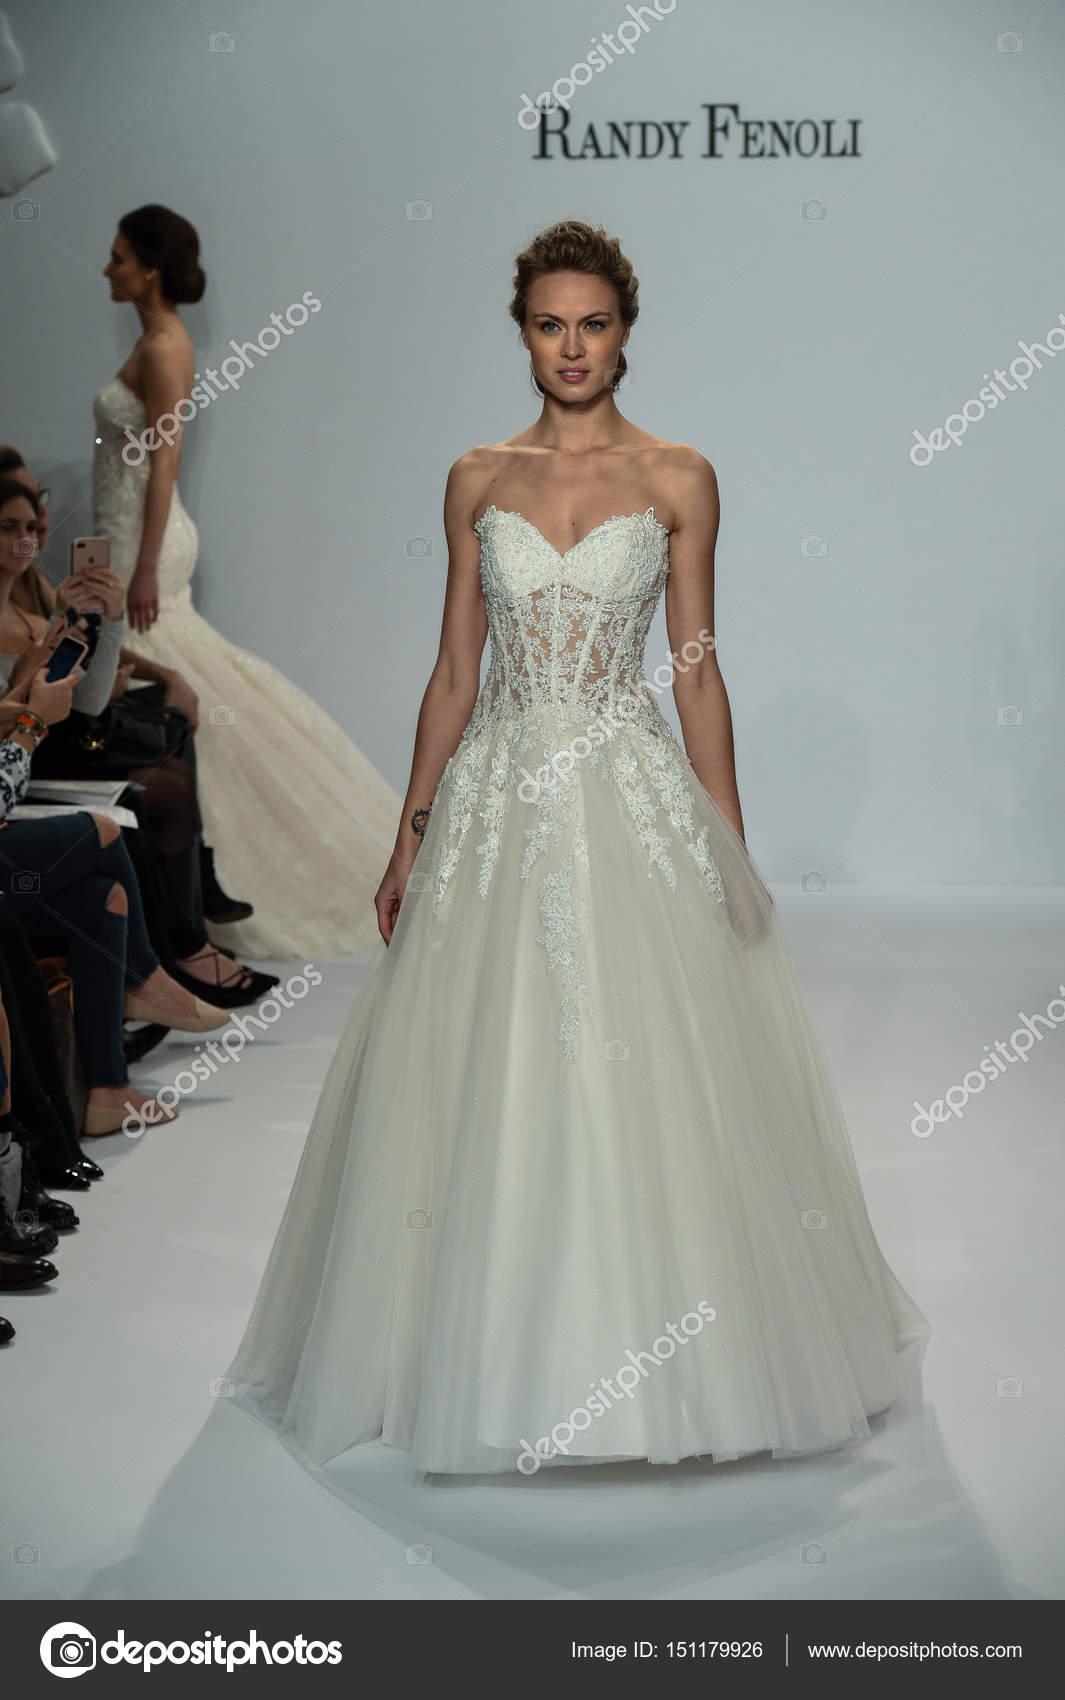 Voir La Randy Fenoli Bridal Photo éditoriale Fashionstock 151179926